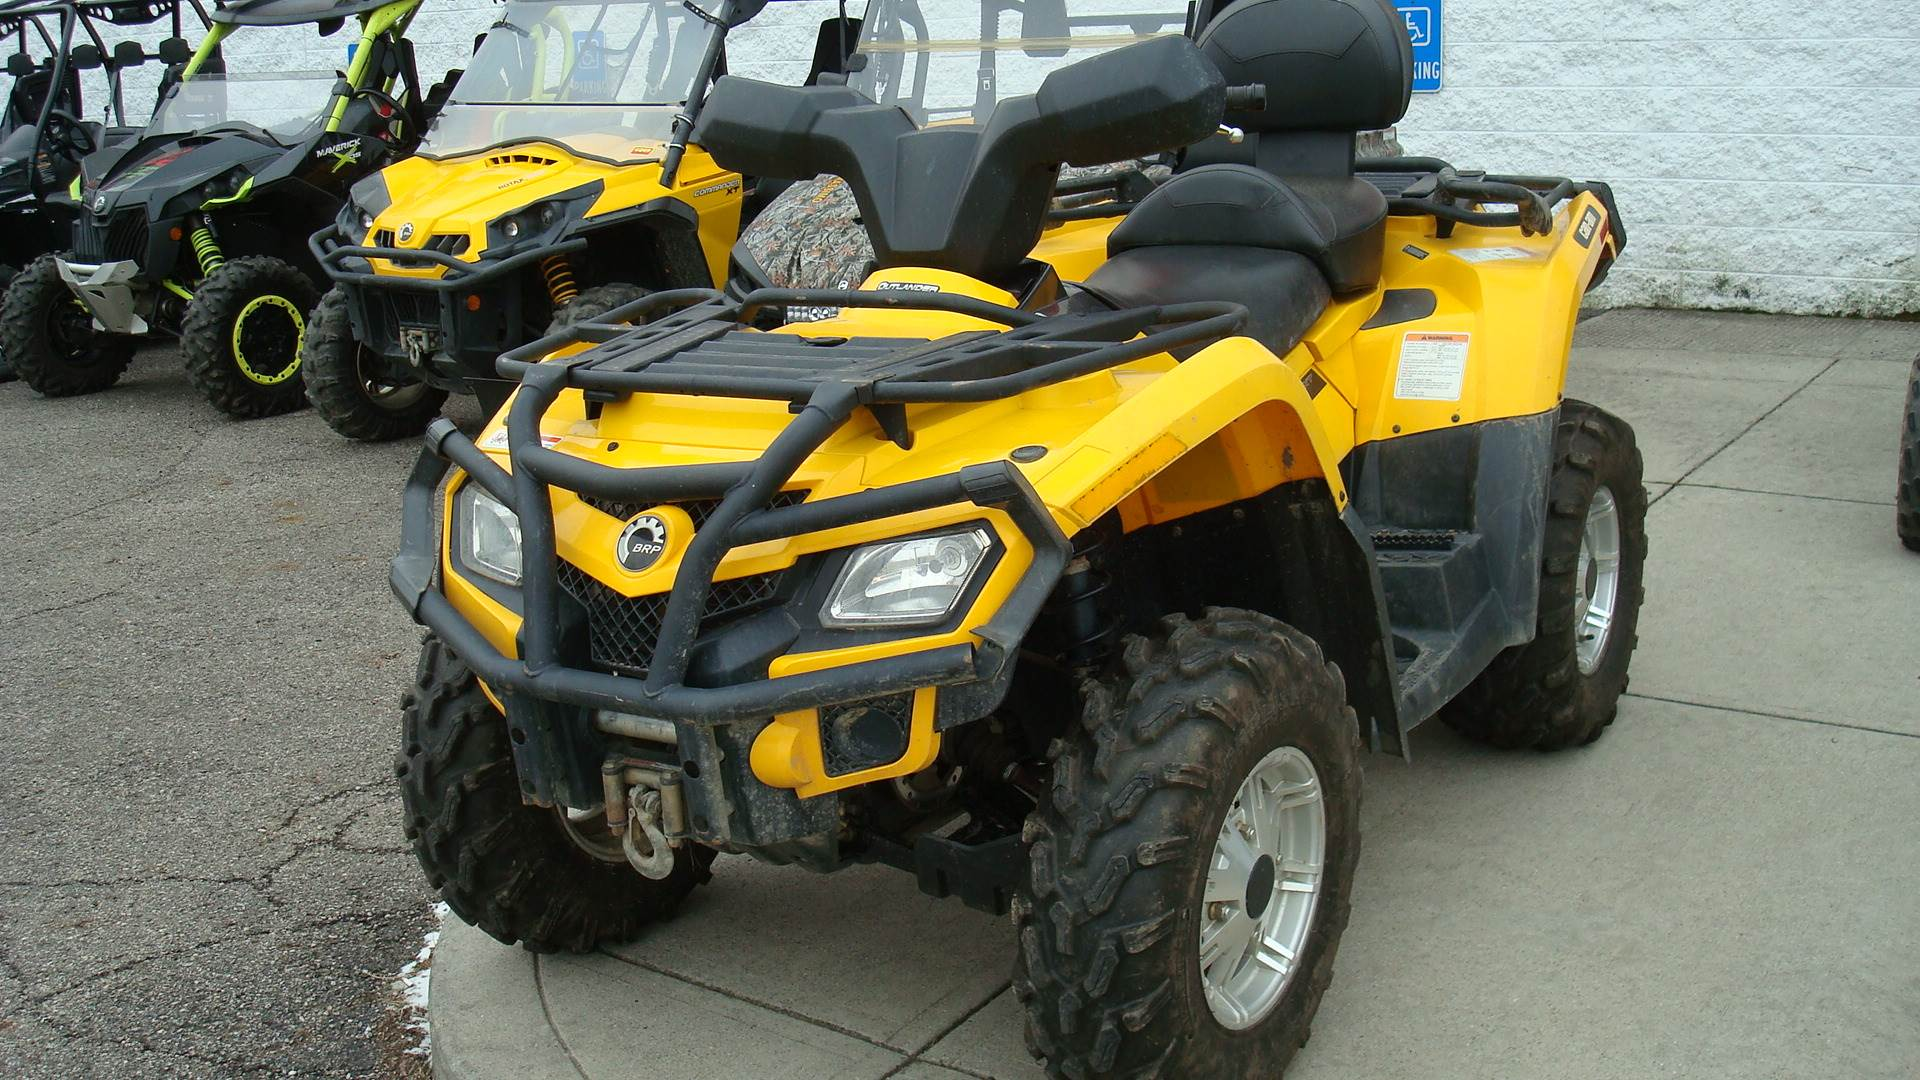 2011 OUTLANDER 400 MAX XT